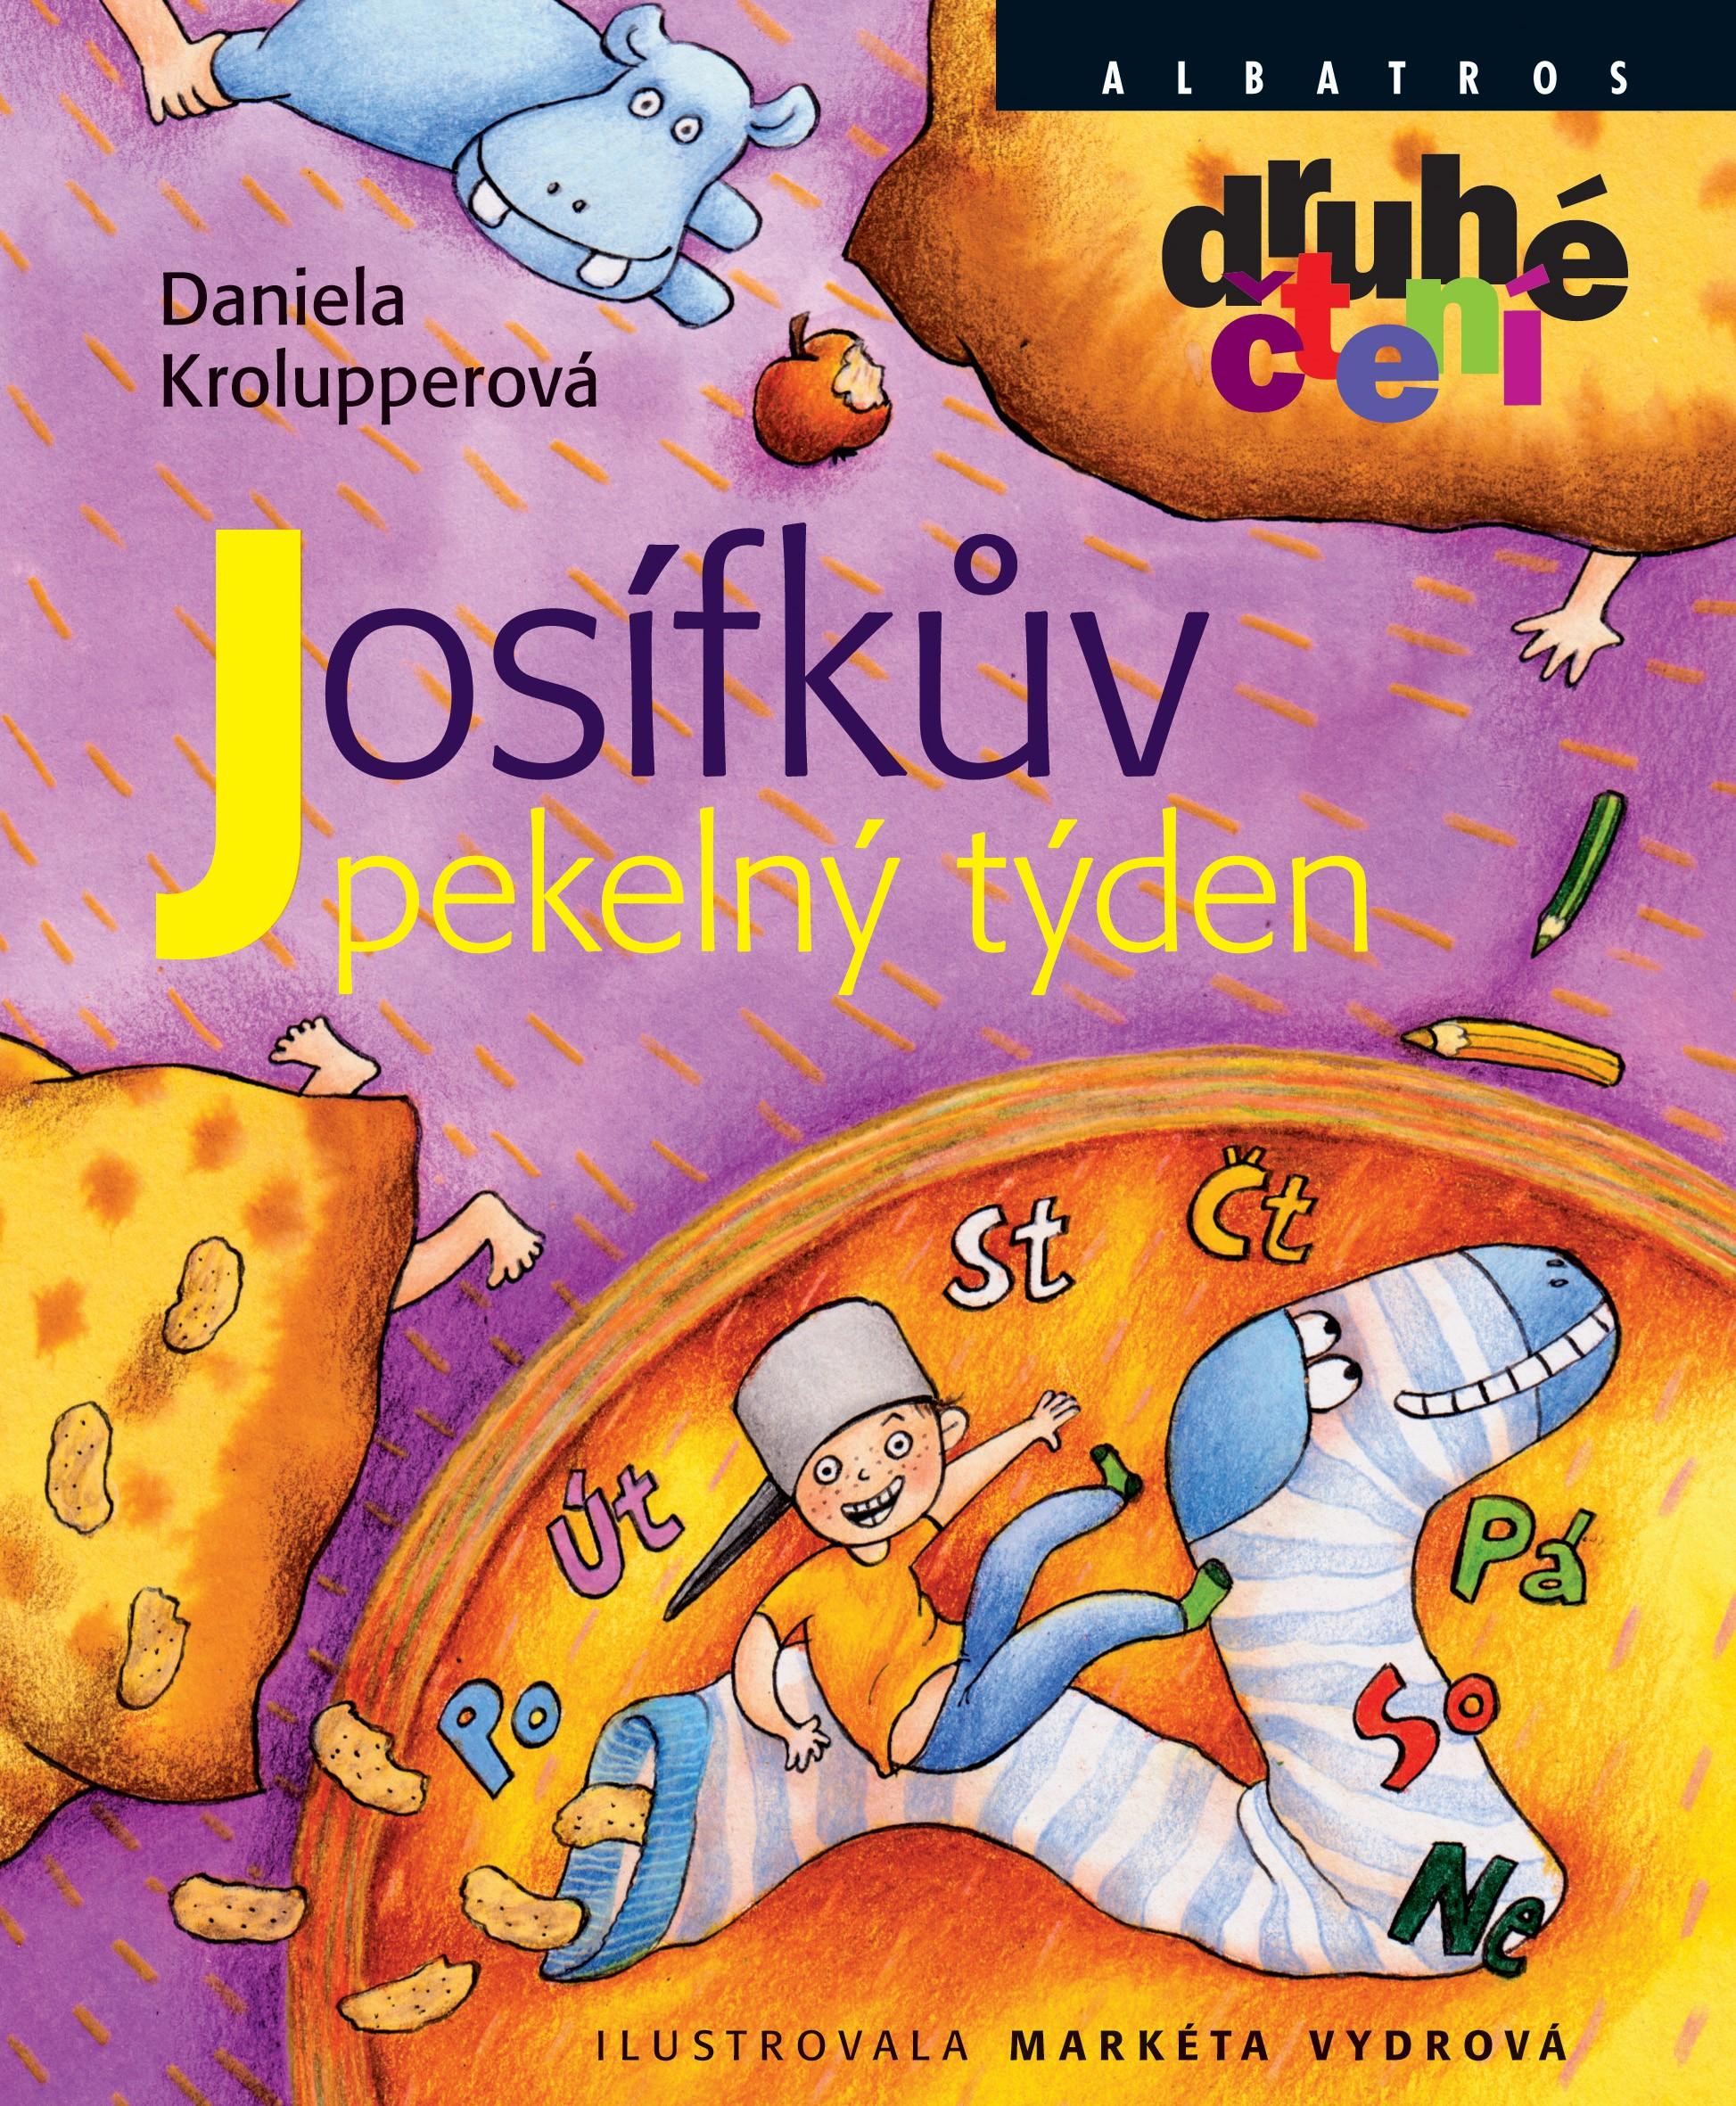 Josífkův pekelný týden   Markéta Vydrová, Daniela Krolupperová